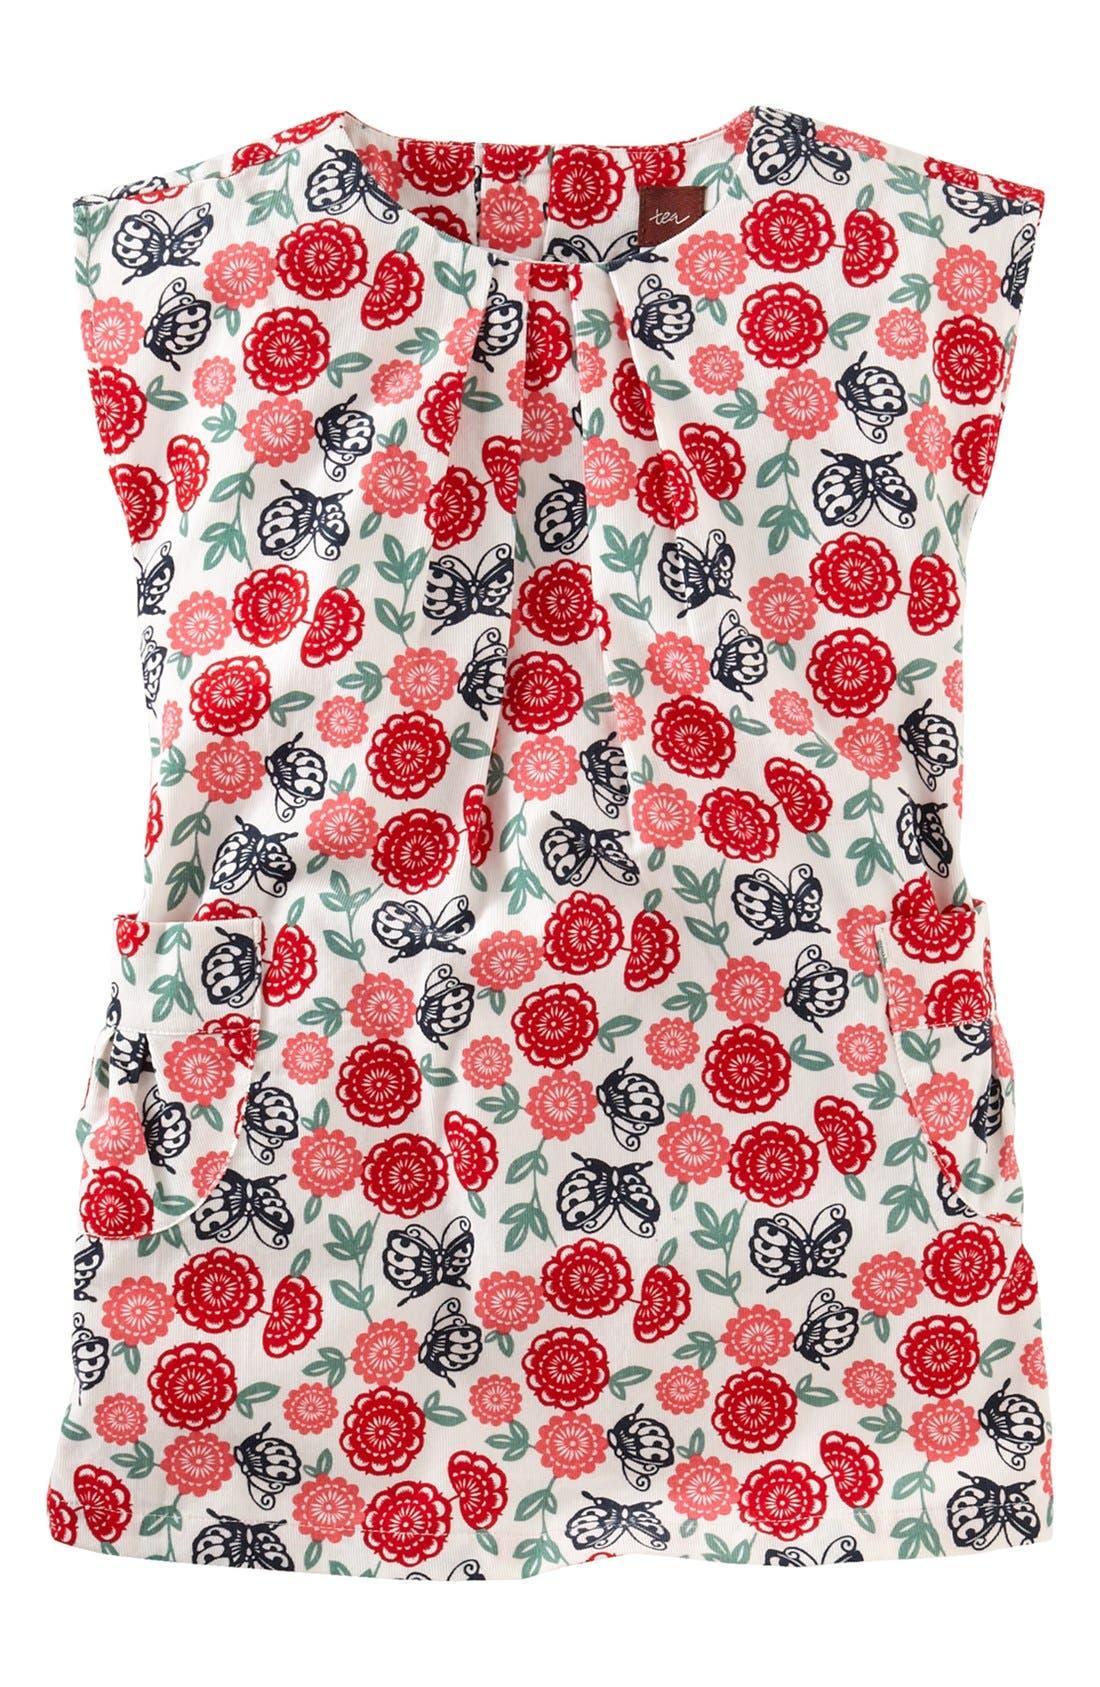 Alternate Image 1 Selected - Tea Collection 'Butterfly' Dress (Little Girls & Big Girls)